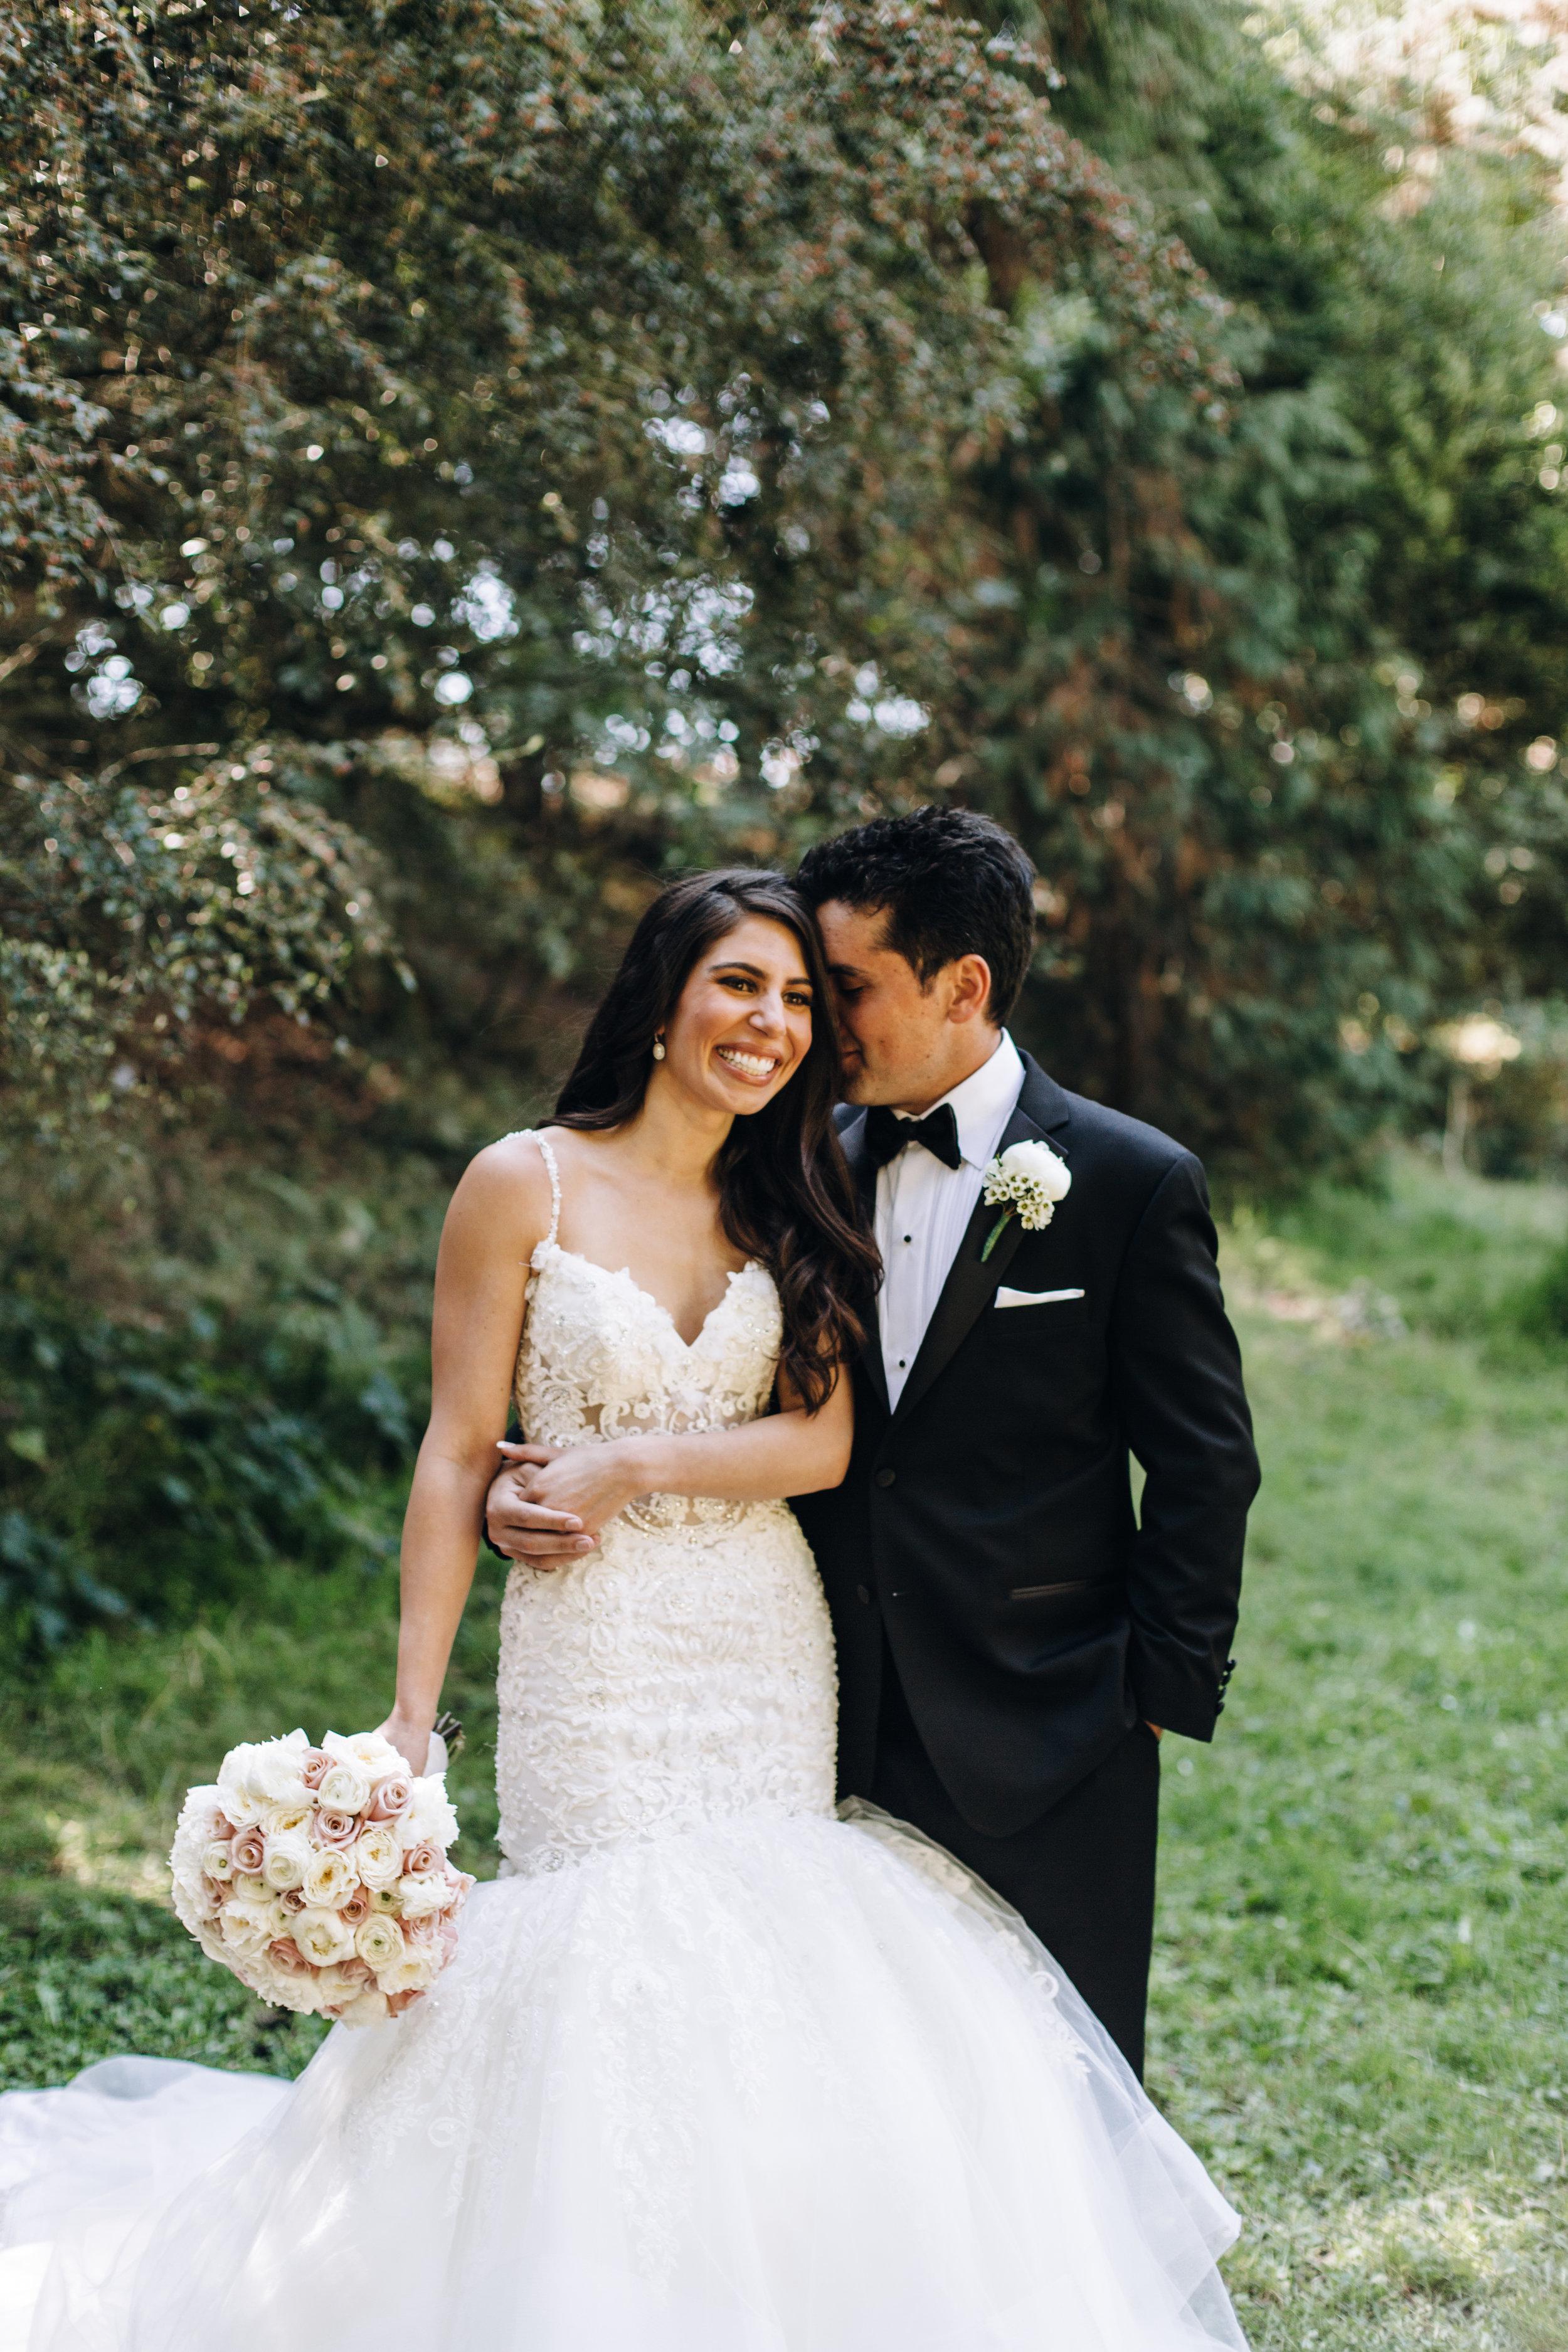 KaraNixonWeddings-GreekOrthodox-Oakland-Wedding-21.jpg